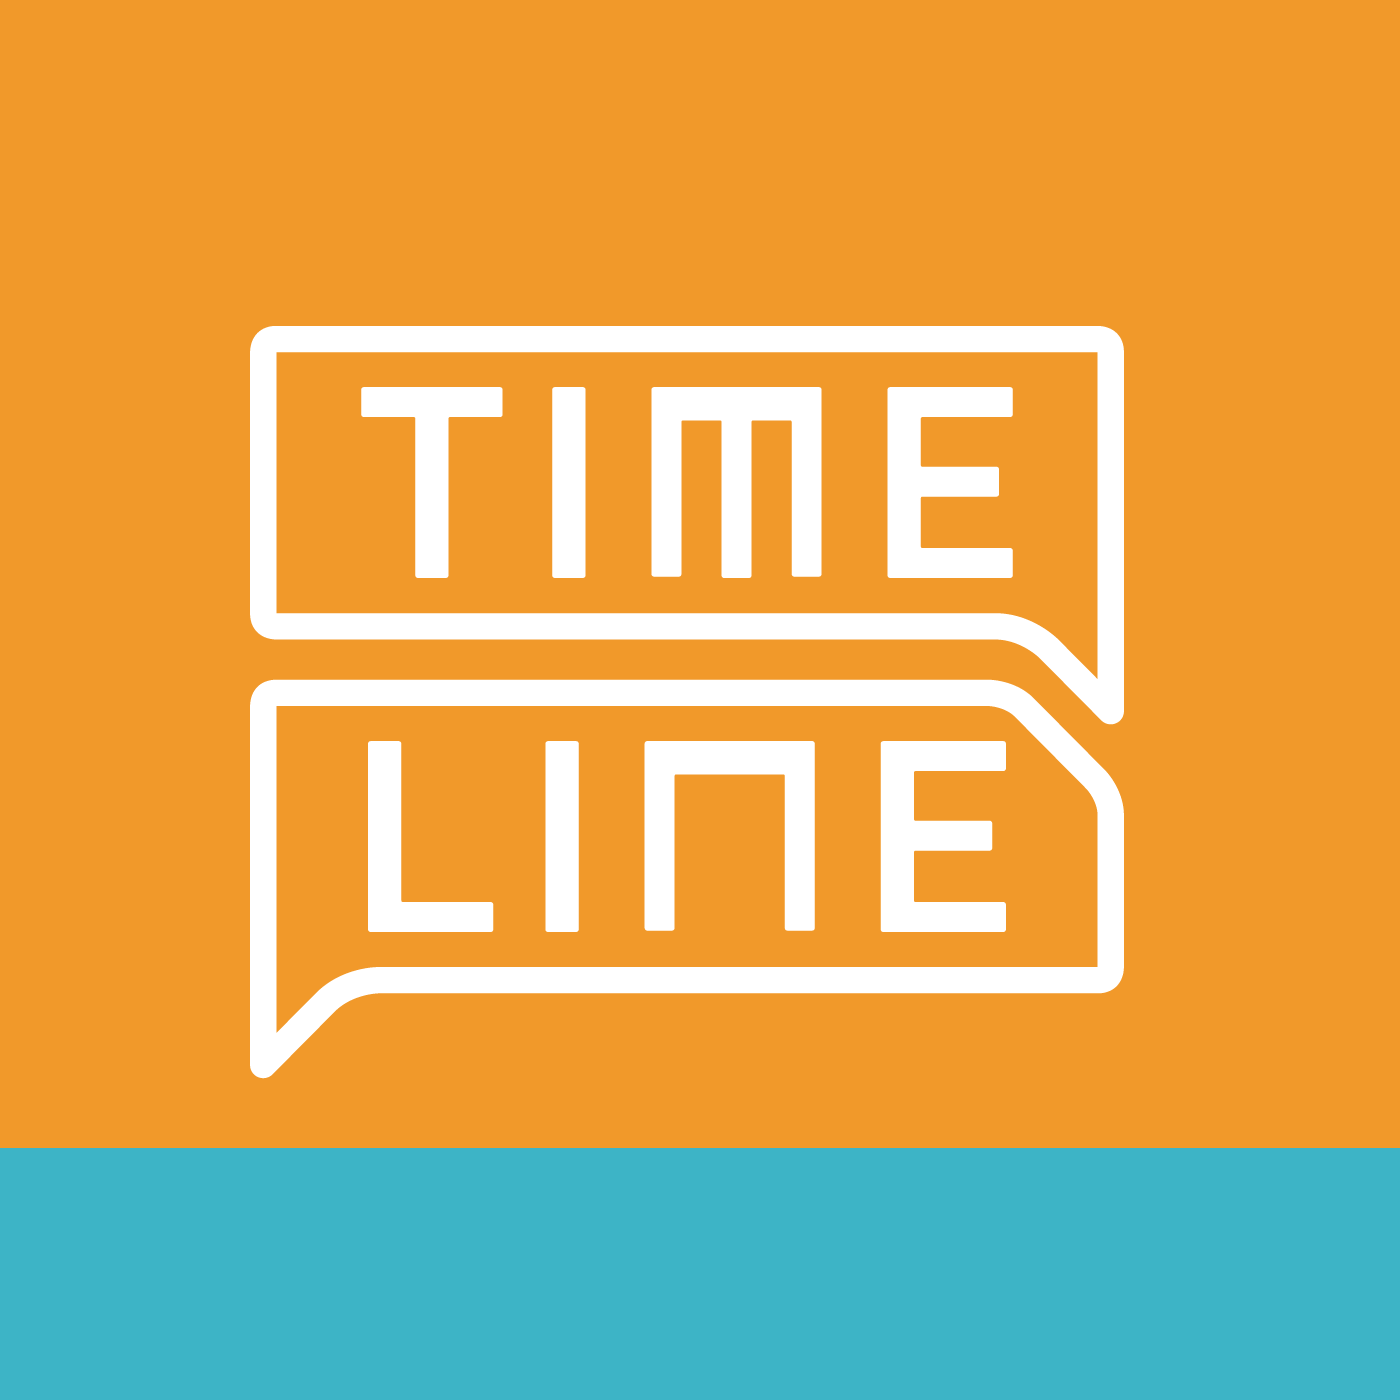 Timeline Gaúcha 28/03/2017